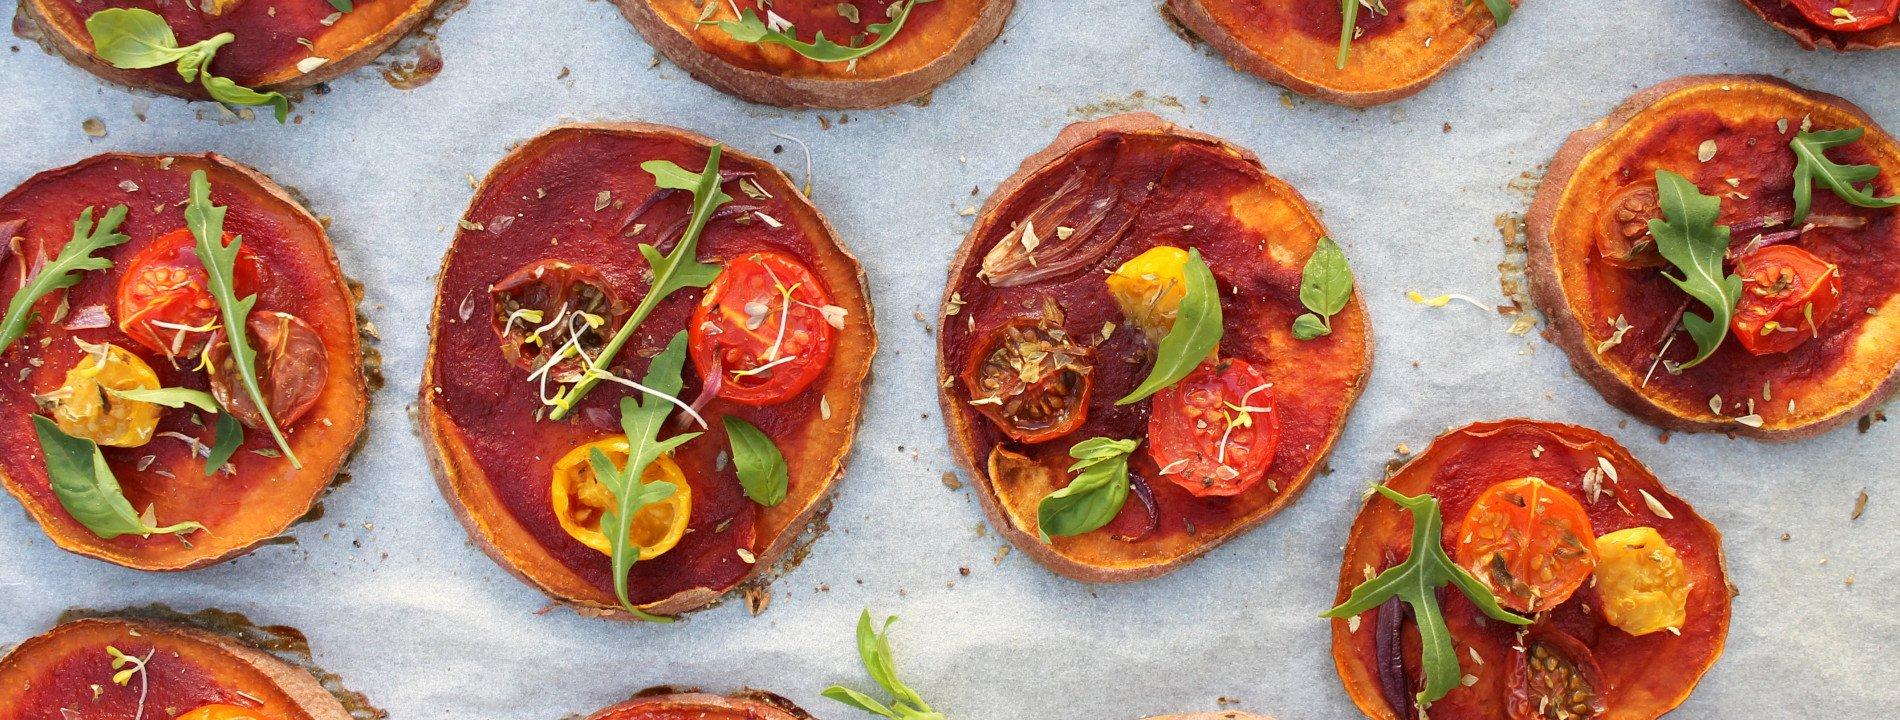 Mini Pizzas Simbióticas de Batata Doce